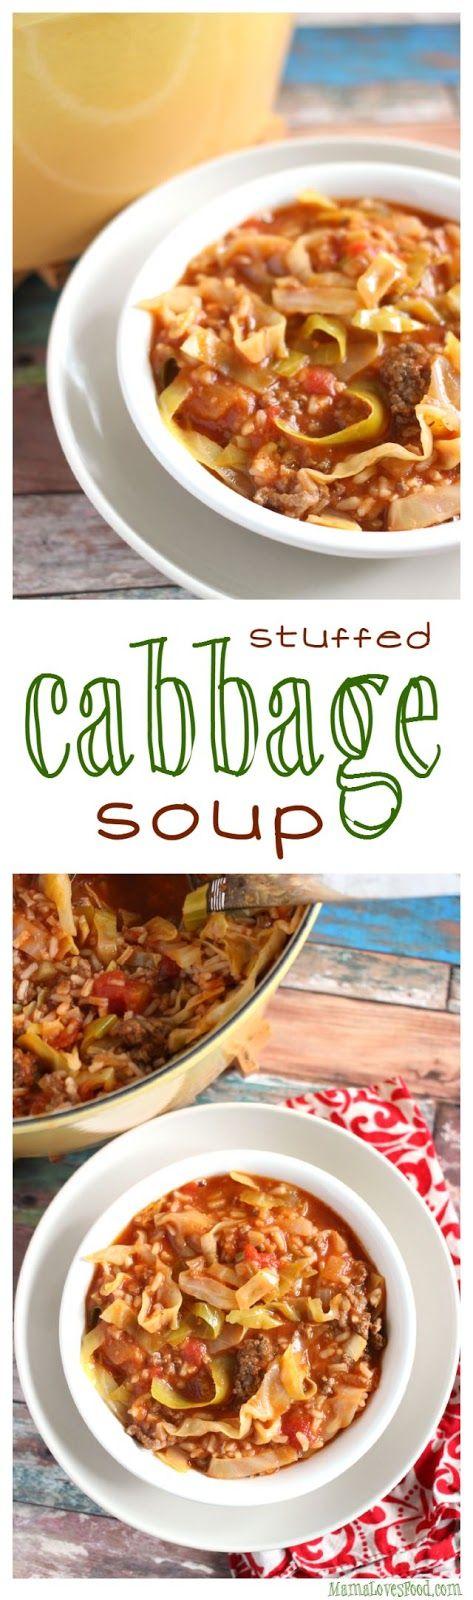 Stuffed Cabbage Soup!